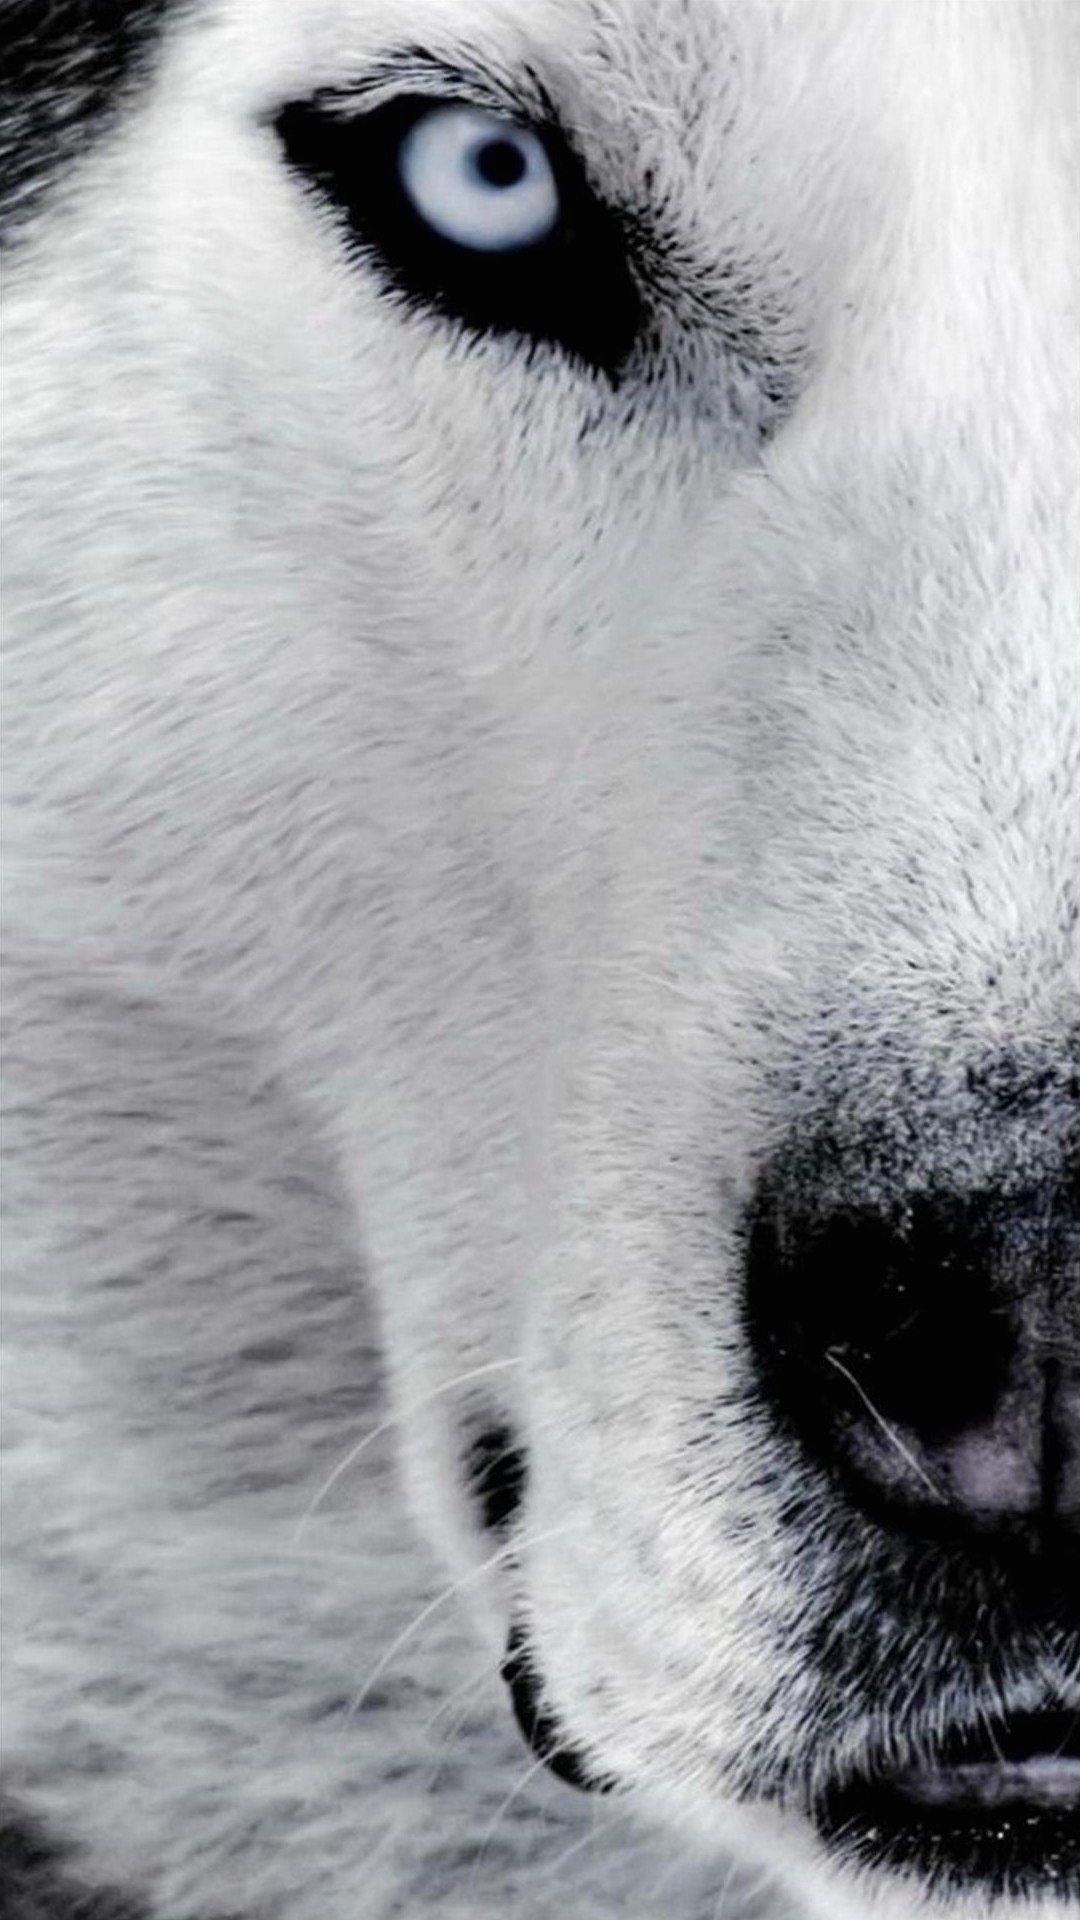 Wallpaper Full Hd 1080 X 1920 Smartphone Dog Husky Husky Siberian Husky Wolf Face